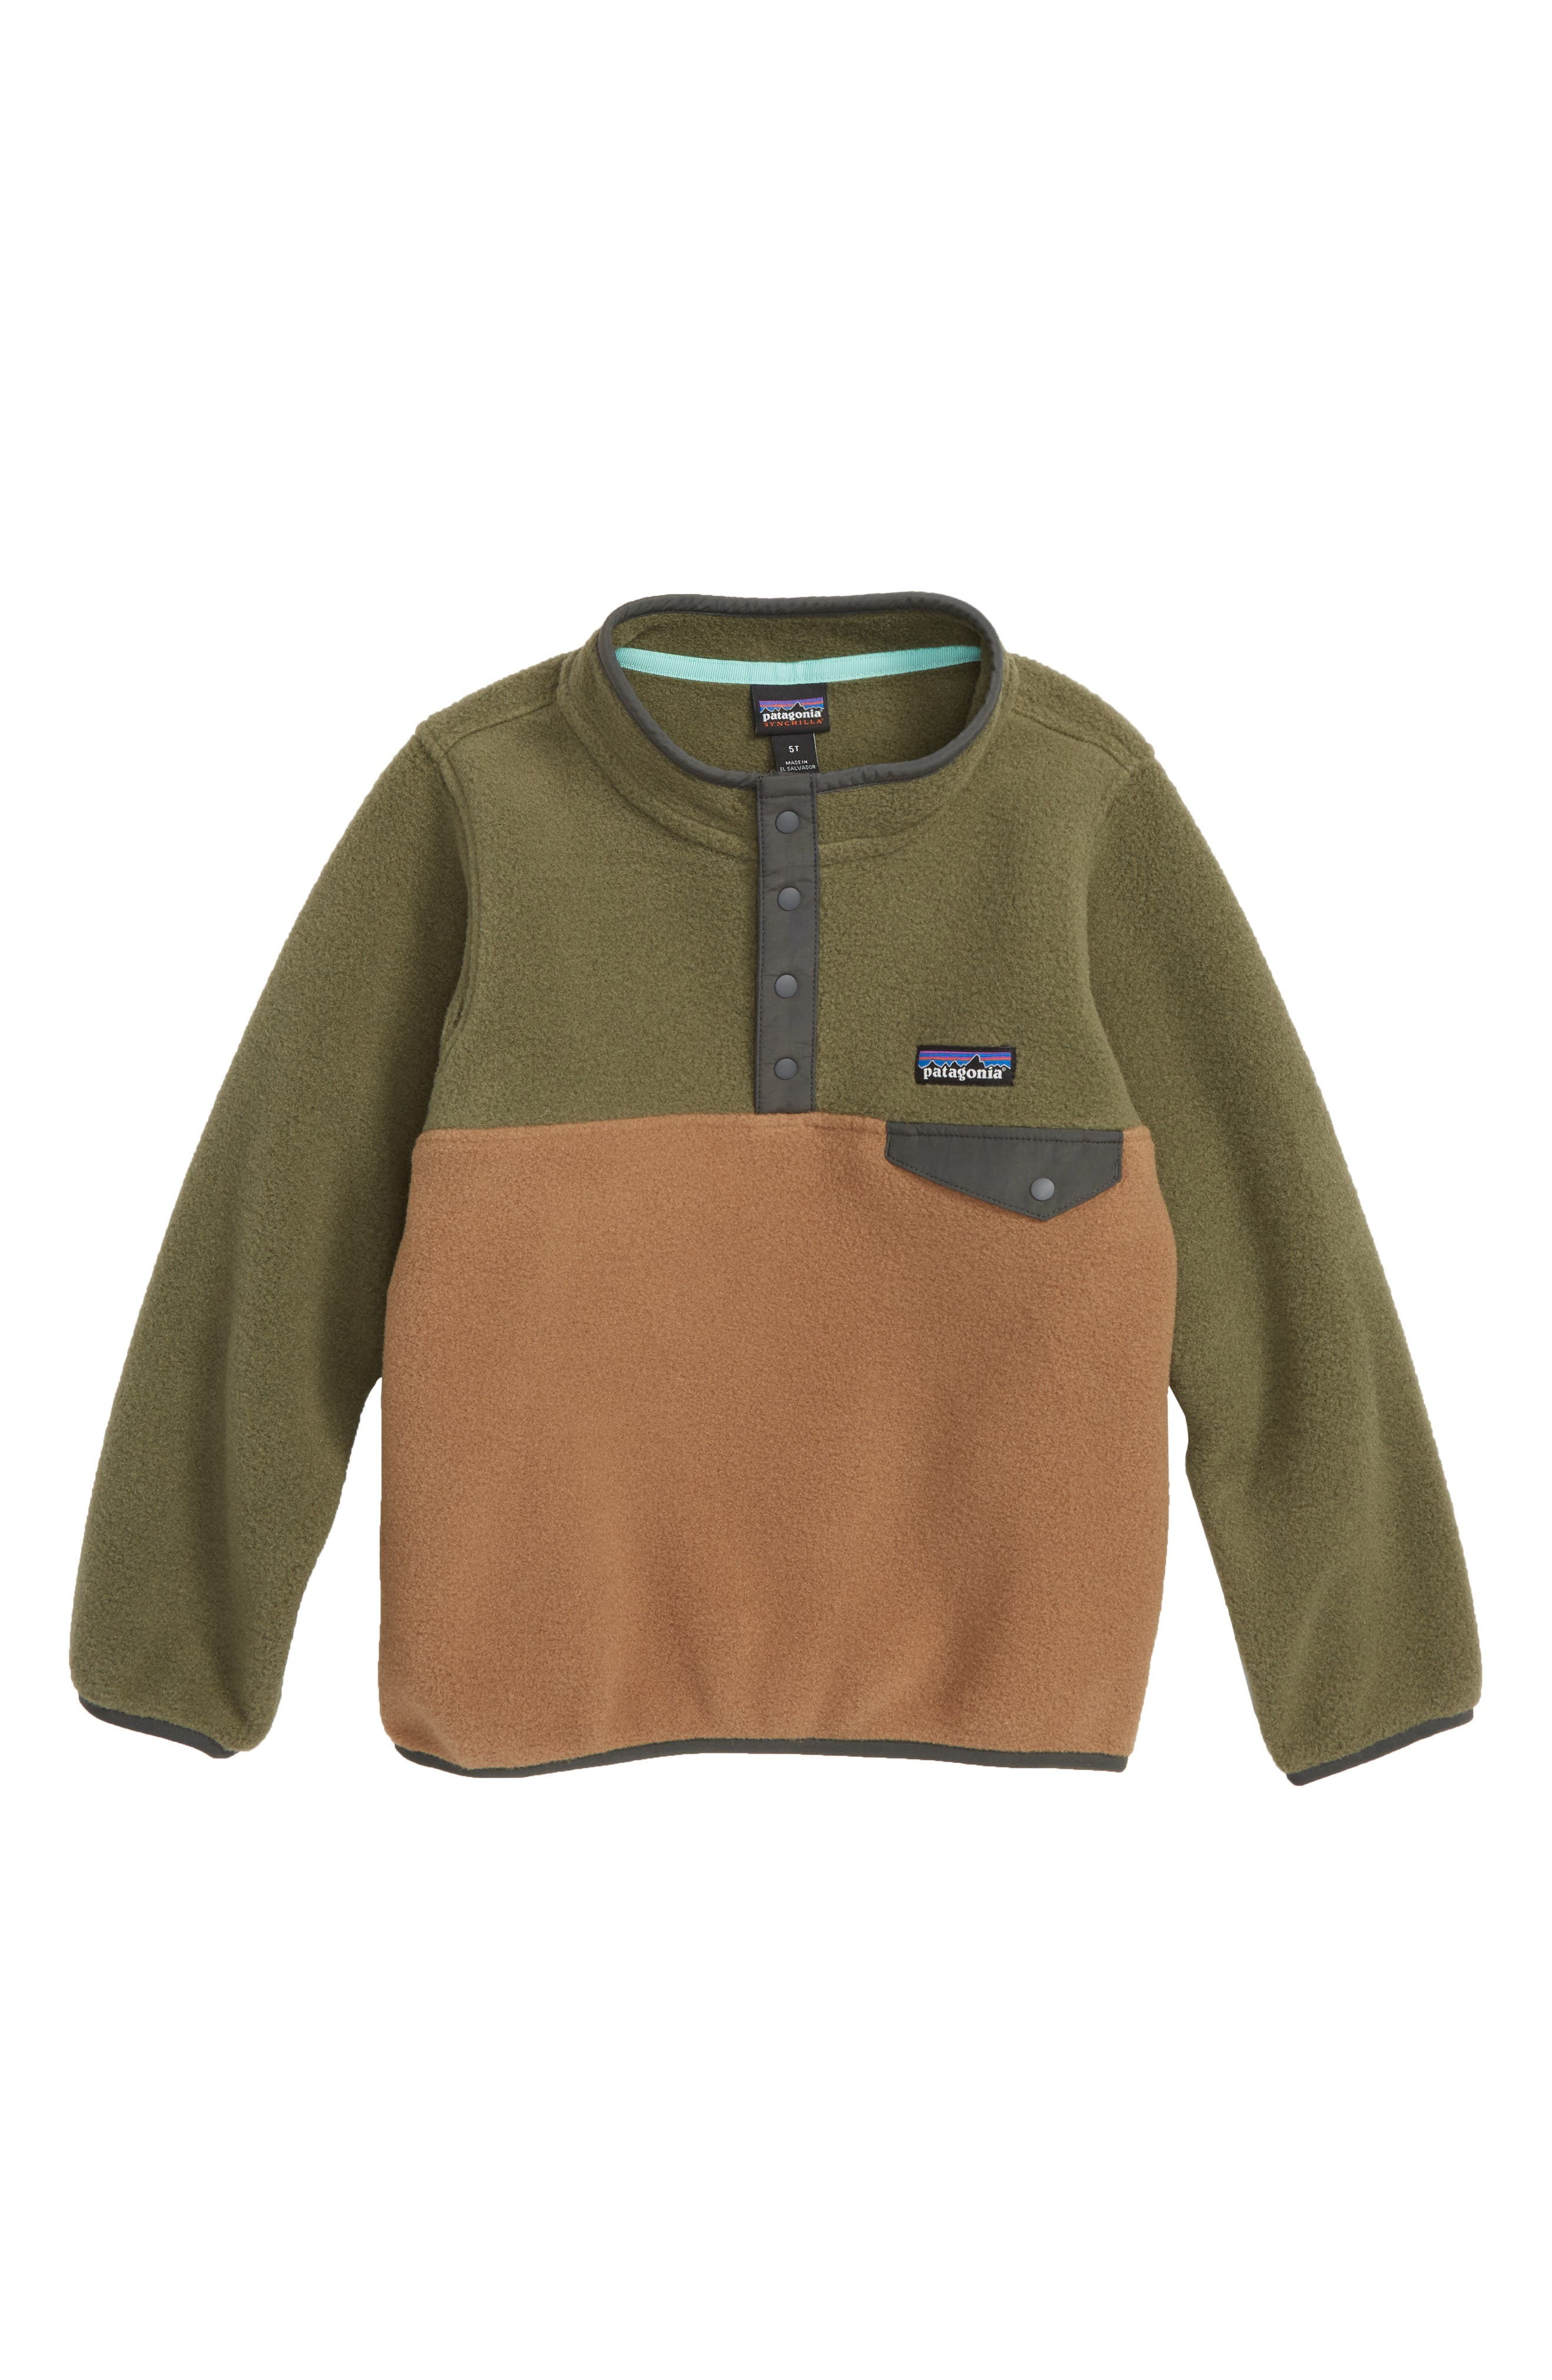 Synchilla<sup>®</sup> Snap-T<sup>®</sup> Fleece Pullover,                         Main,                         color, Coriander Brown